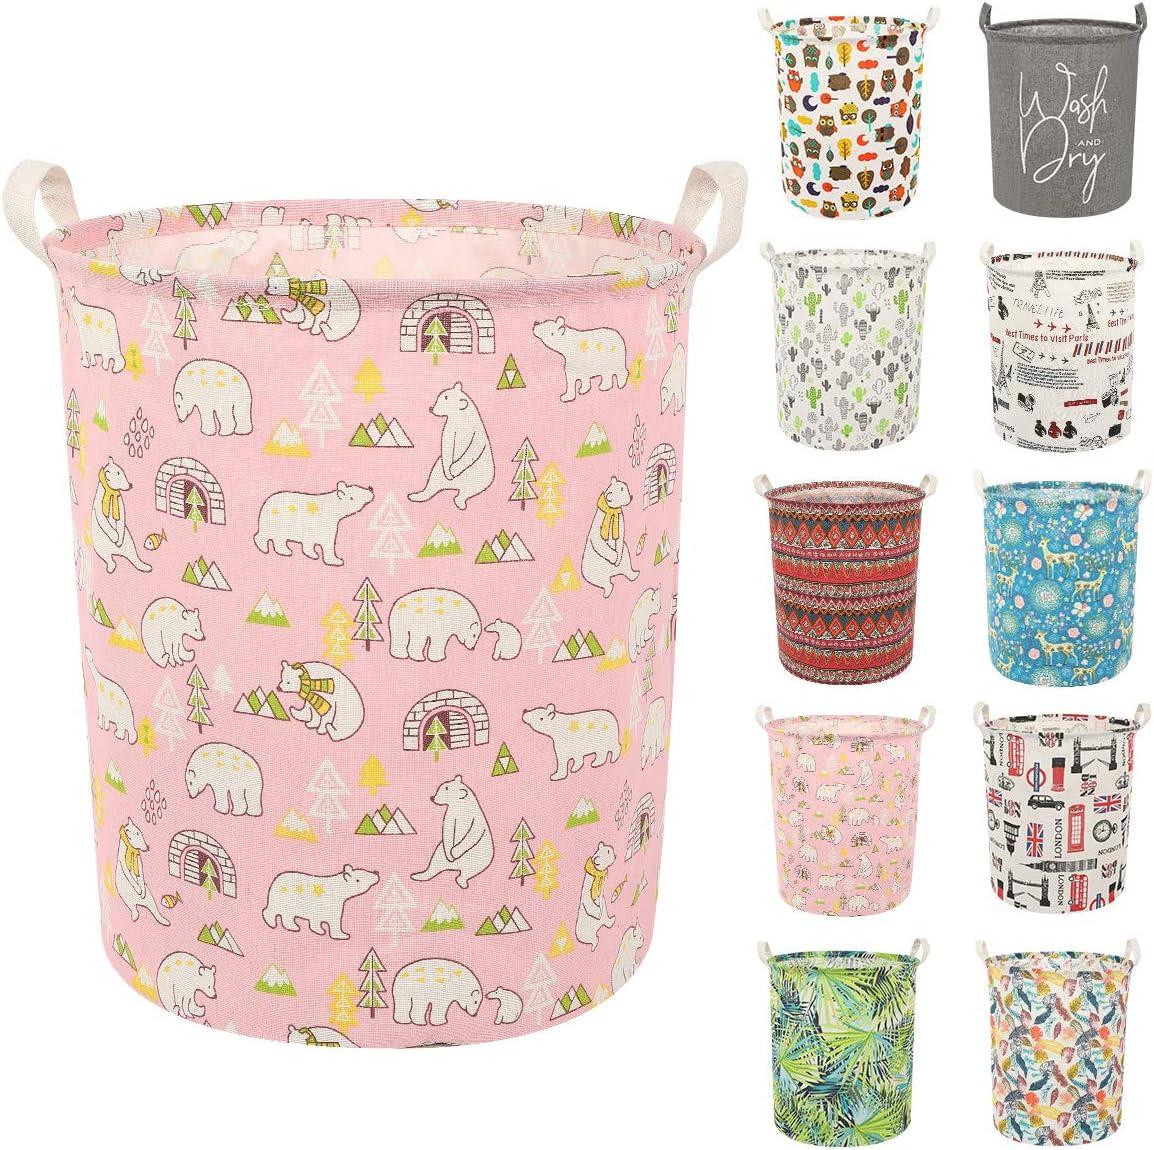 Clothes Laundry Hamper Storage Bin Large Collapsible Storage Basket Kids Canvas Laundry Basket for Home Bedroom Nursery Room (Y-Pink Polar Bear, L)